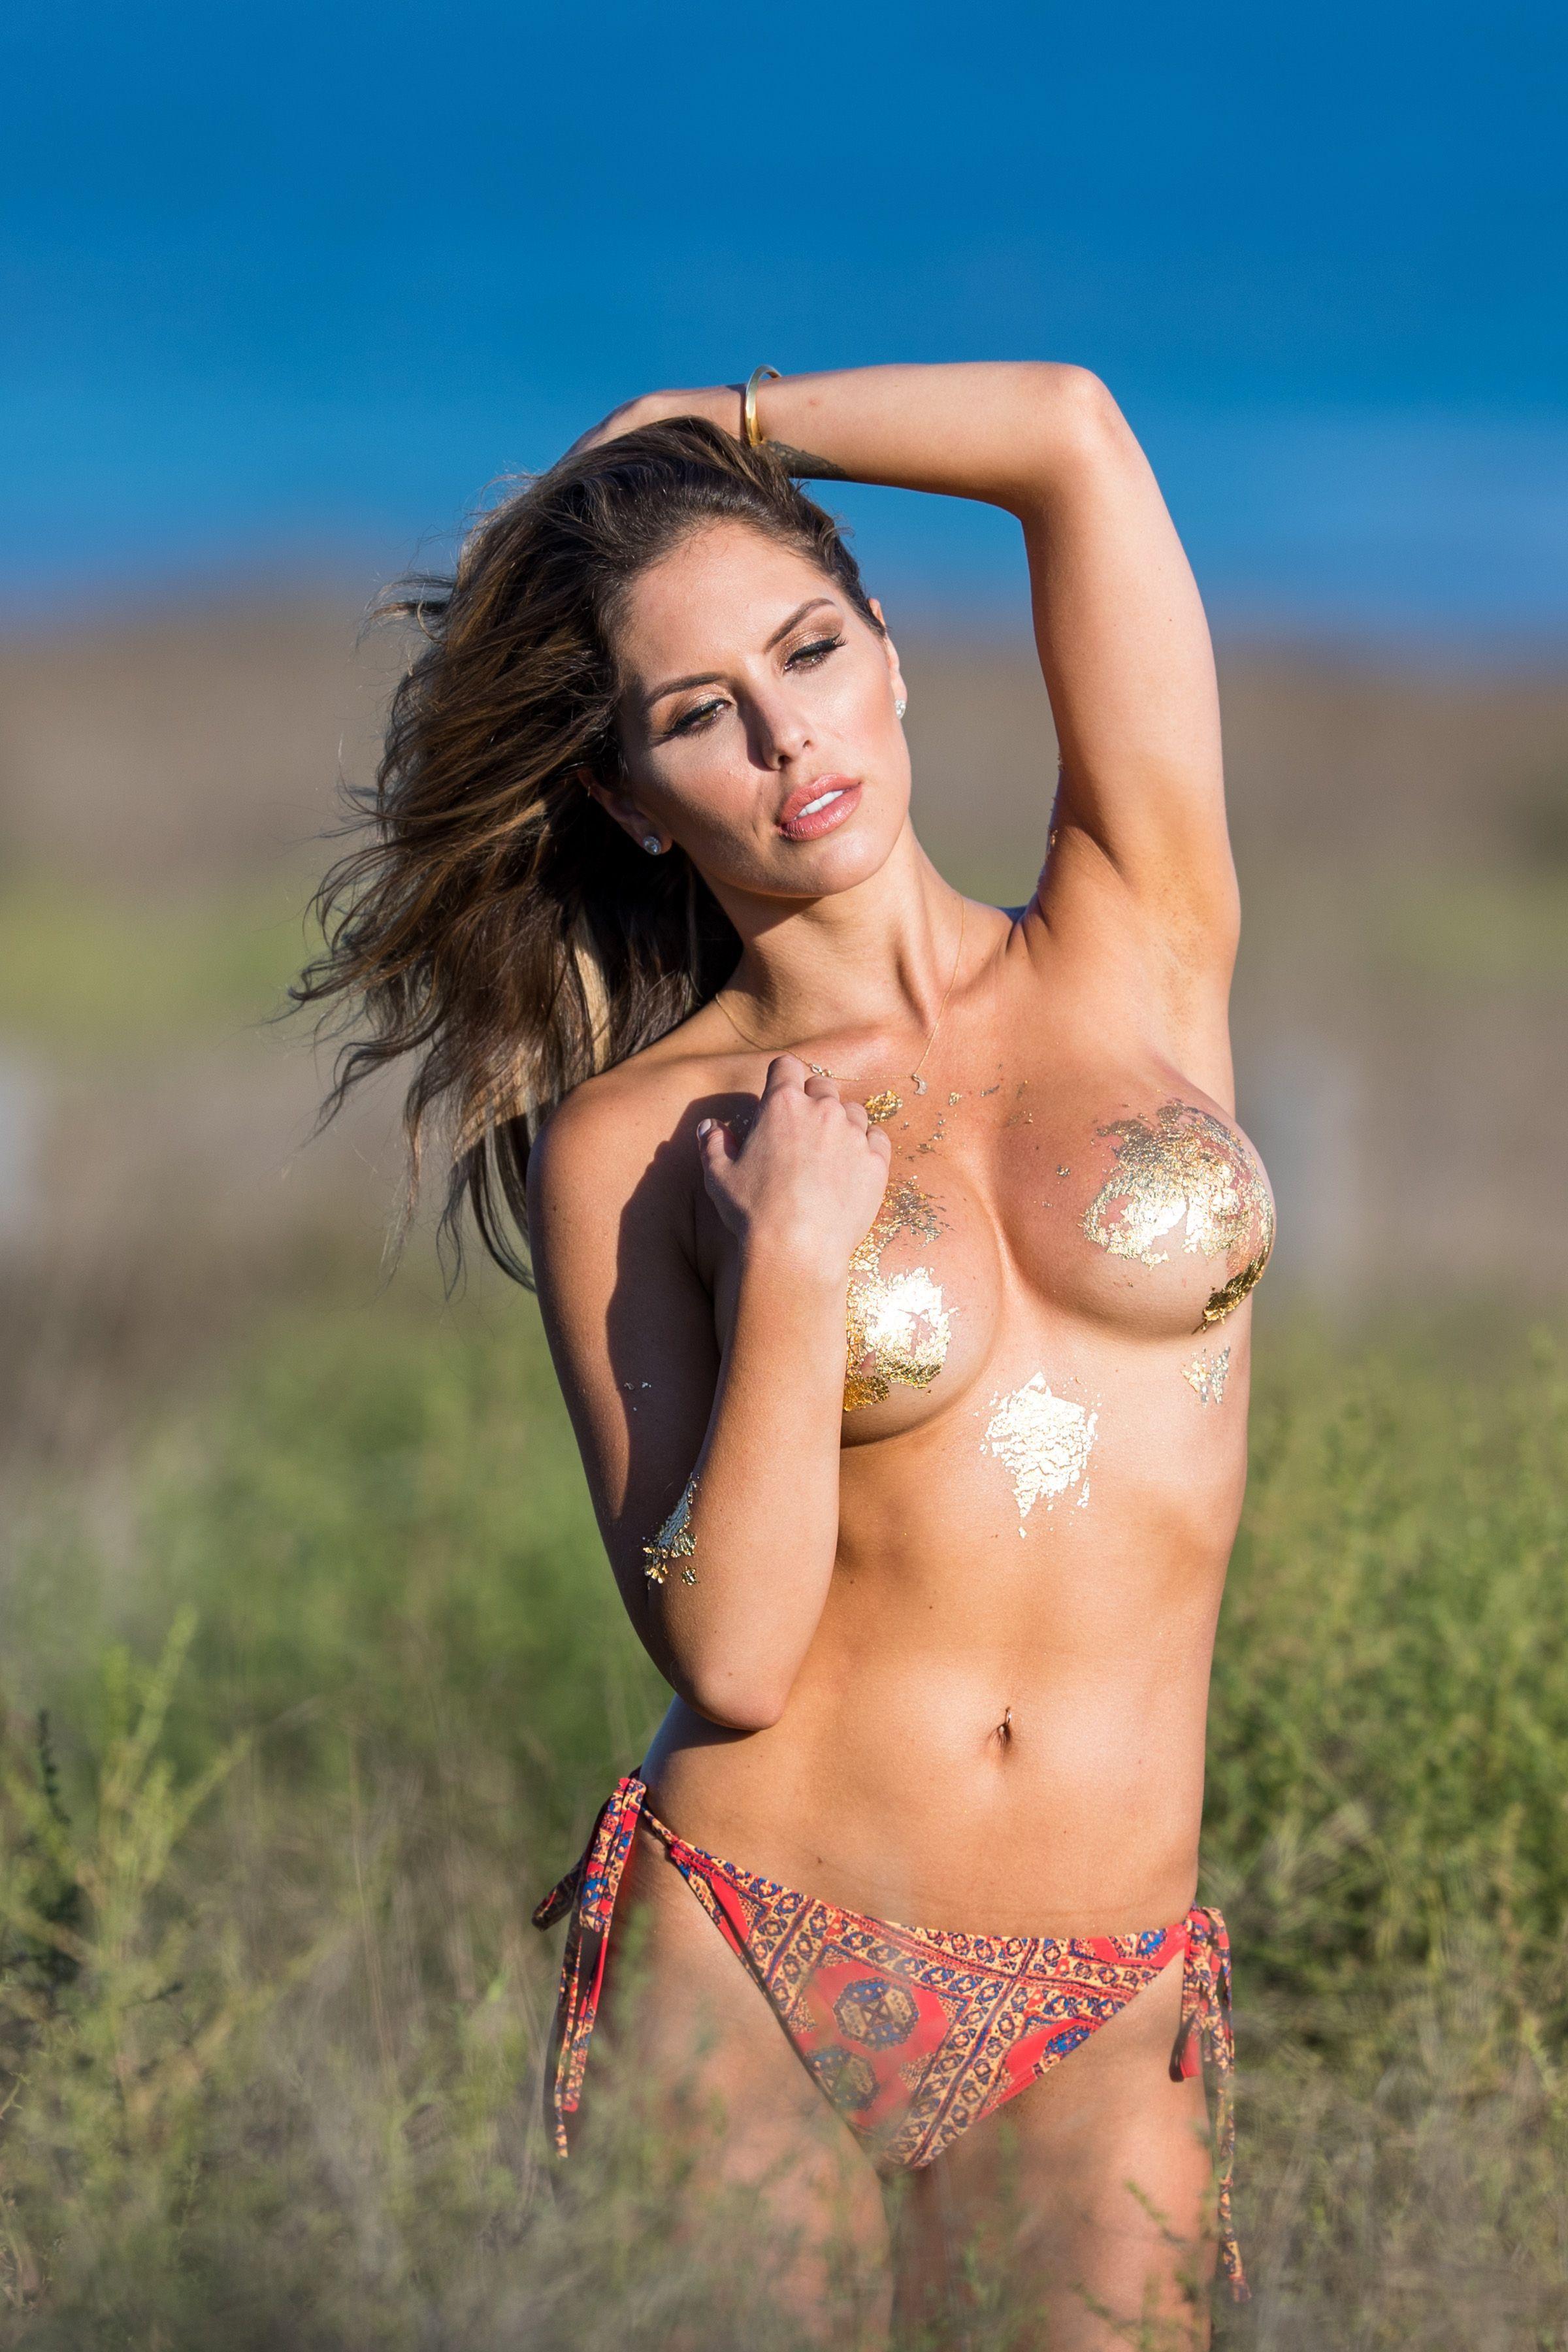 Brittney-Palmer-Sexy-Topless-11-thefappeningblog.com_.jpg